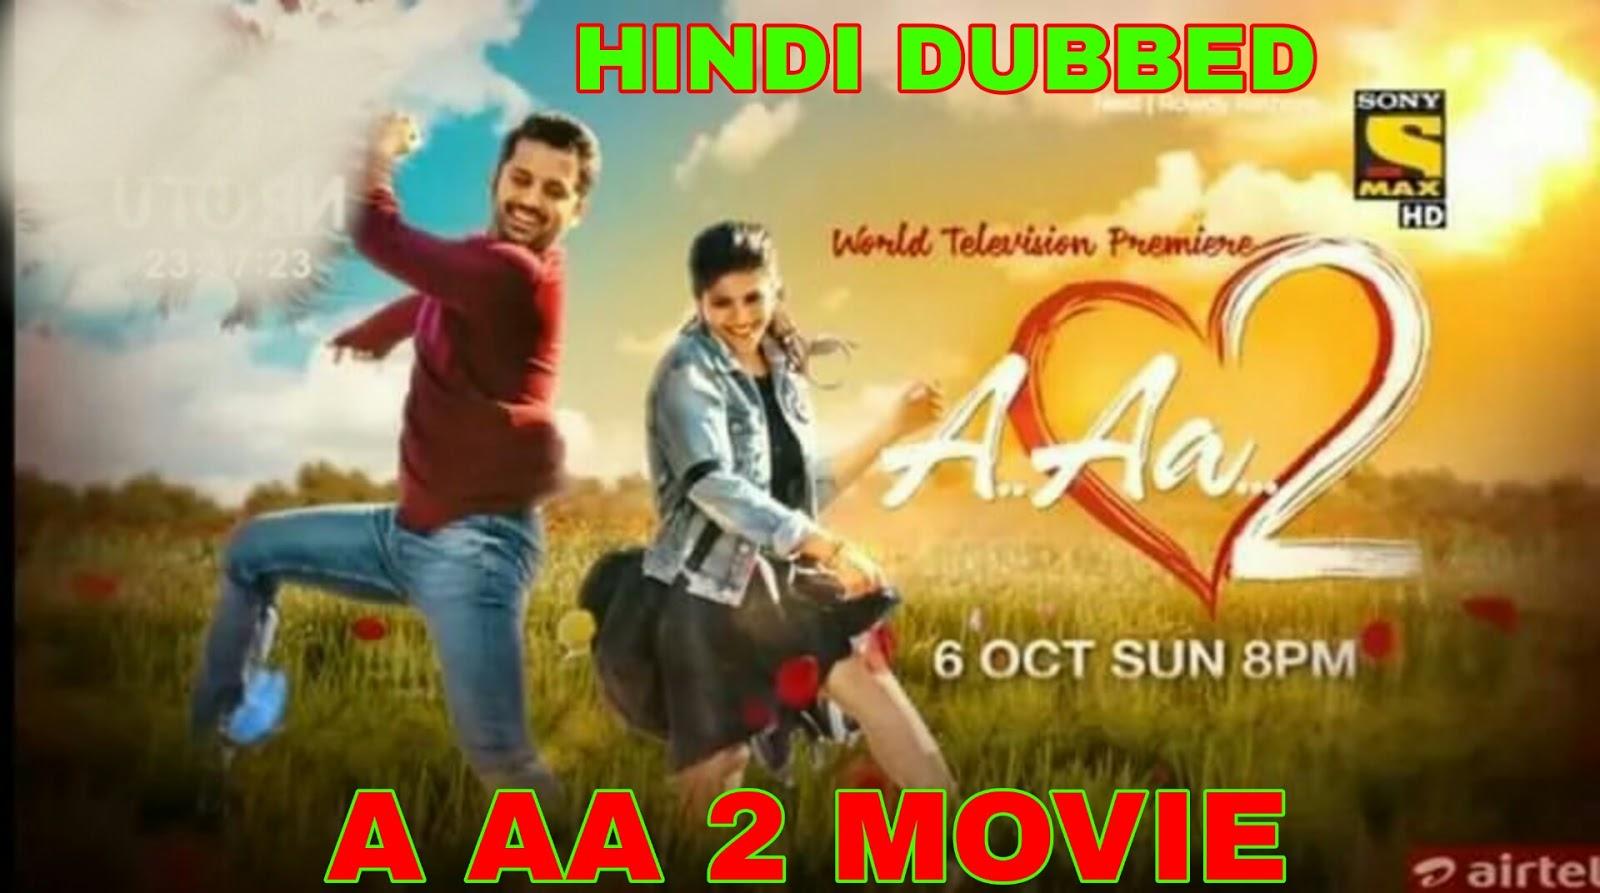 A Aa 2 Hindi Dubbed Full Movie Download 720p hd Filmywap, Filmyzilla, Mp4moviez